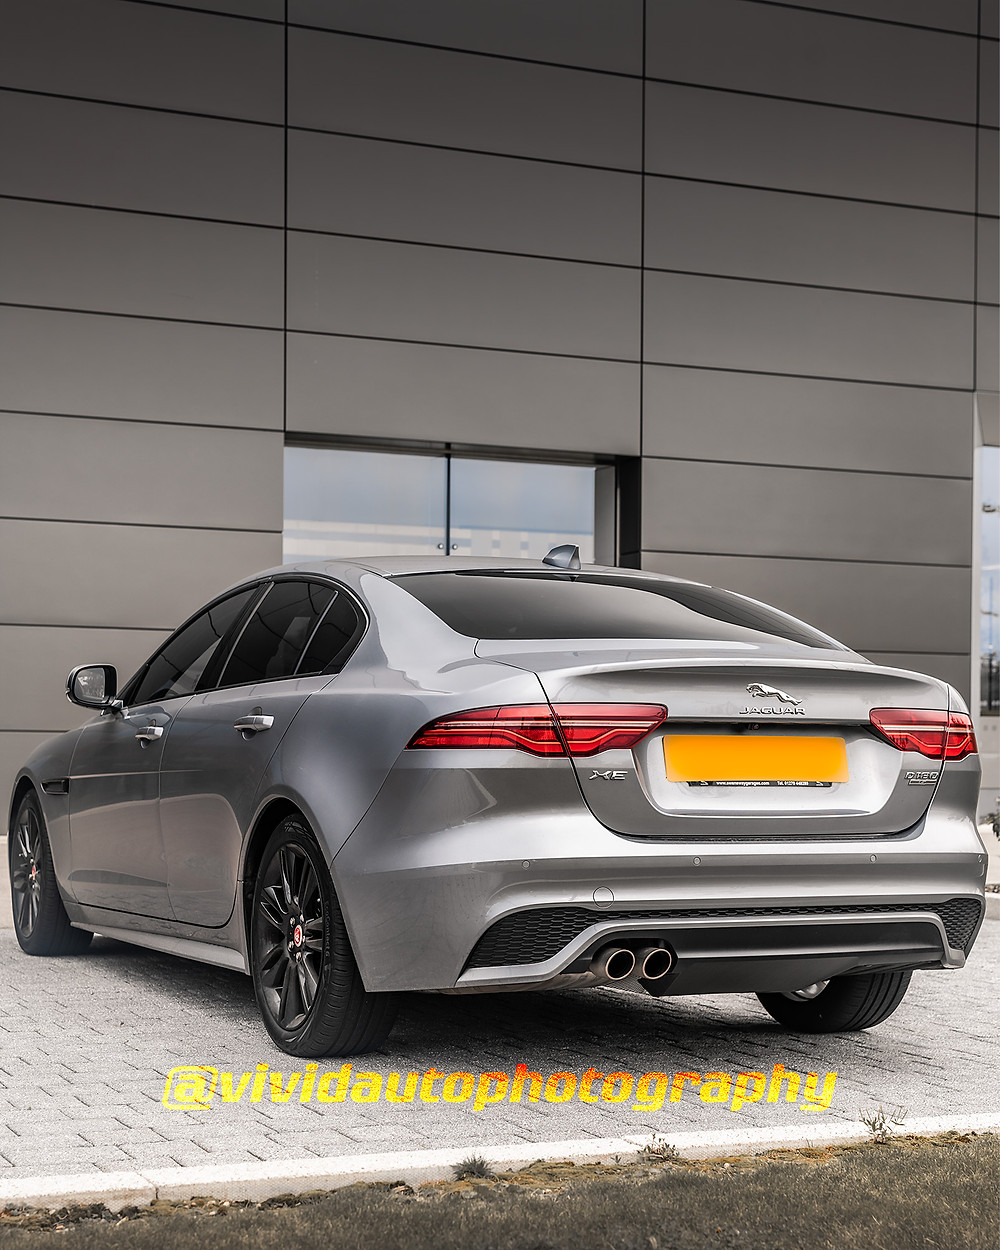 Jaguar XE | Indus Silver | Jaguar Crewe